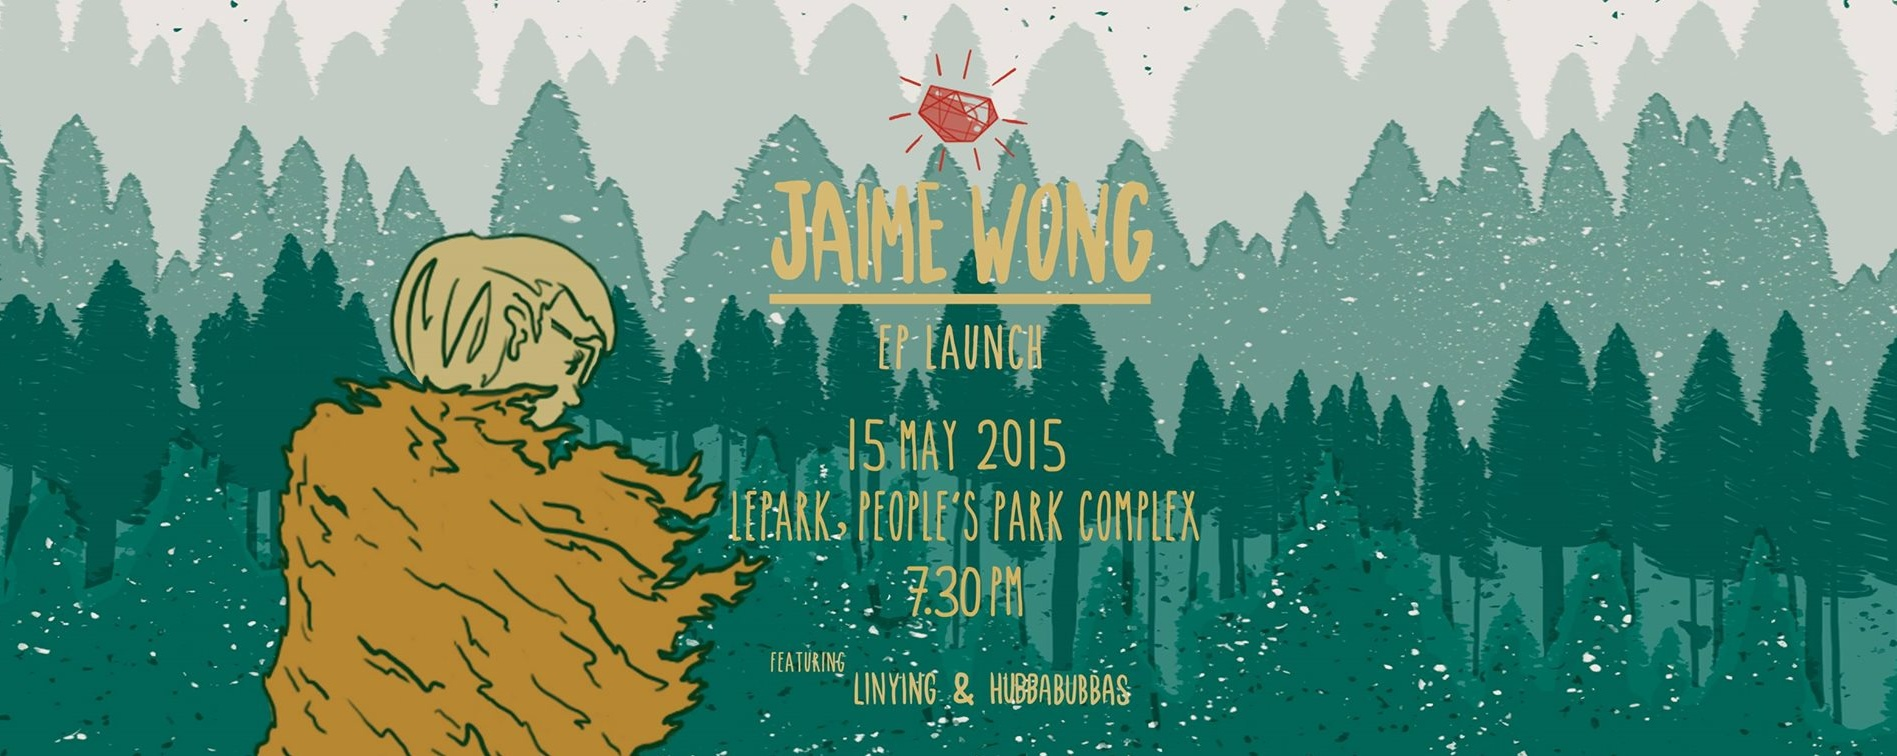 Jaime Wong Debut EP Launch